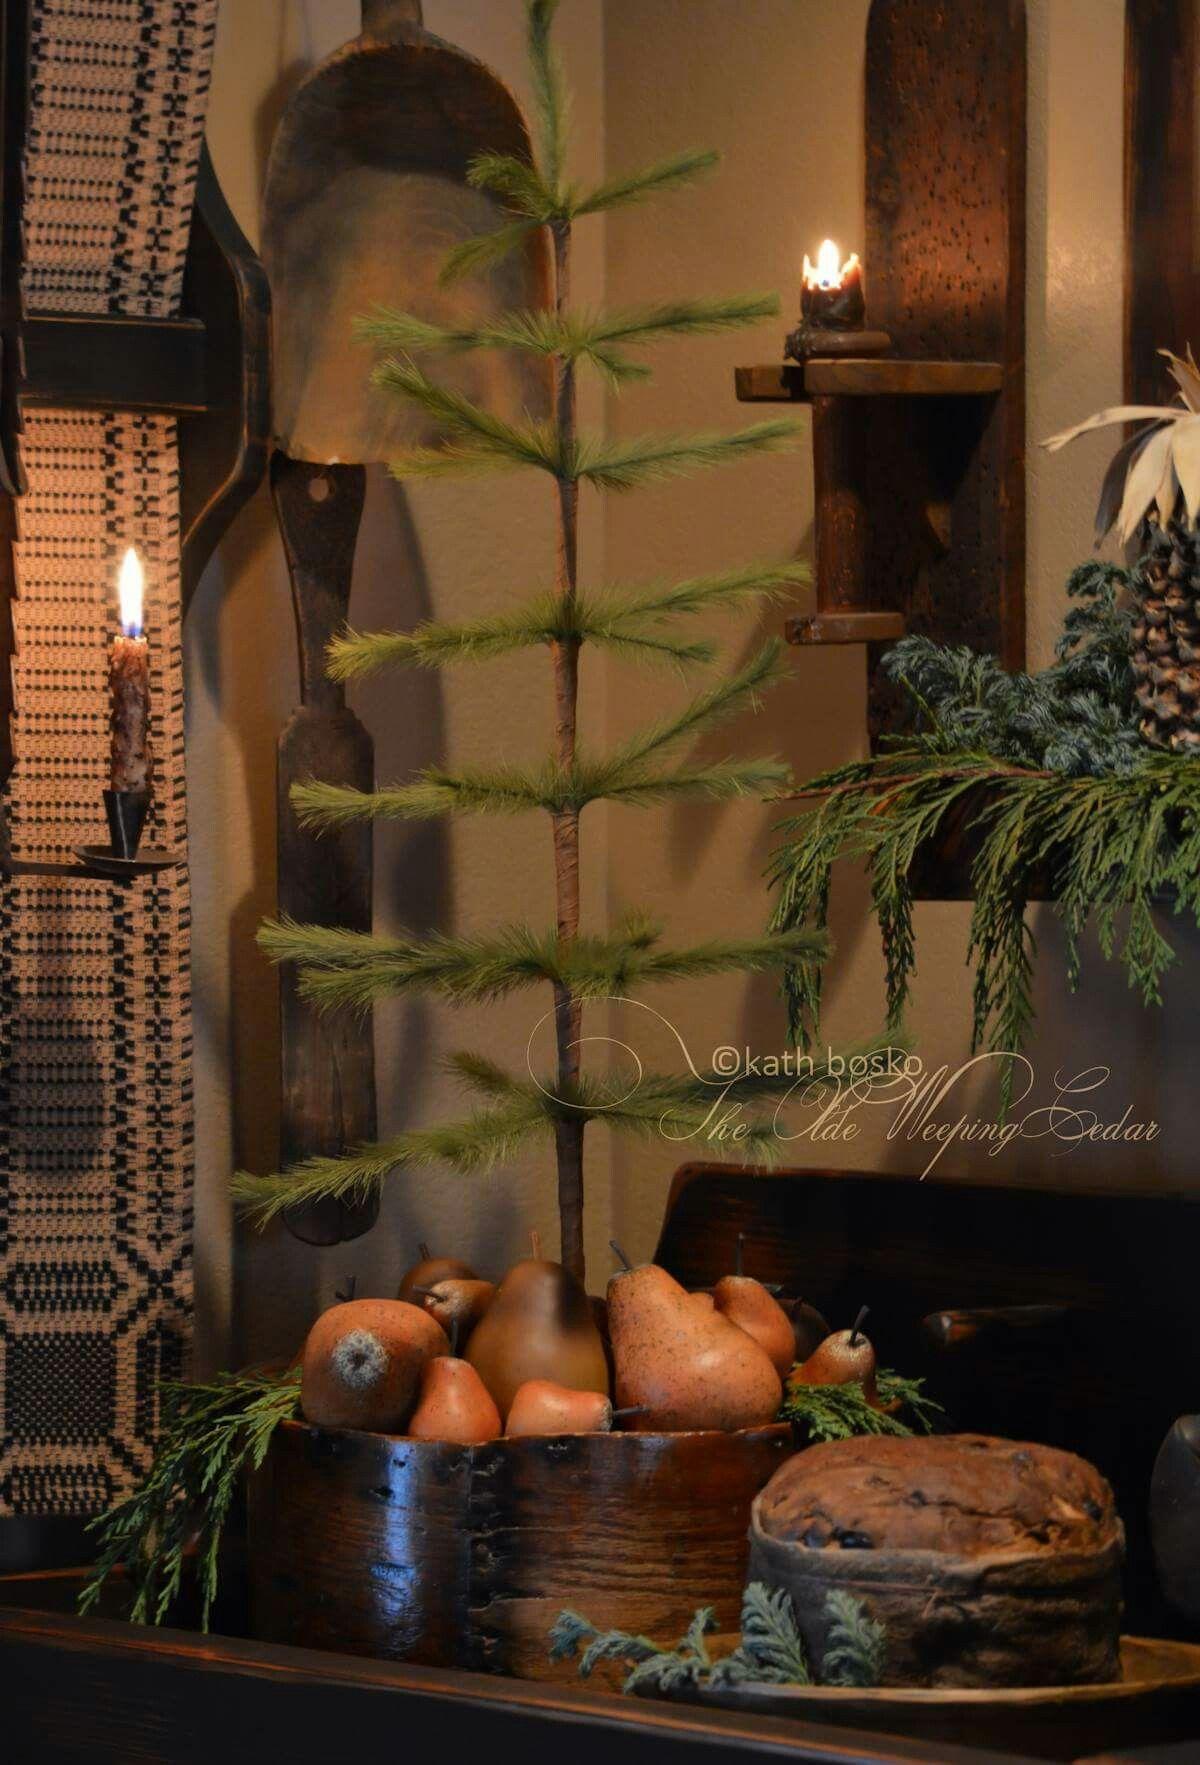 The Olde Weeping Cedar Rustic kitchen cupboard